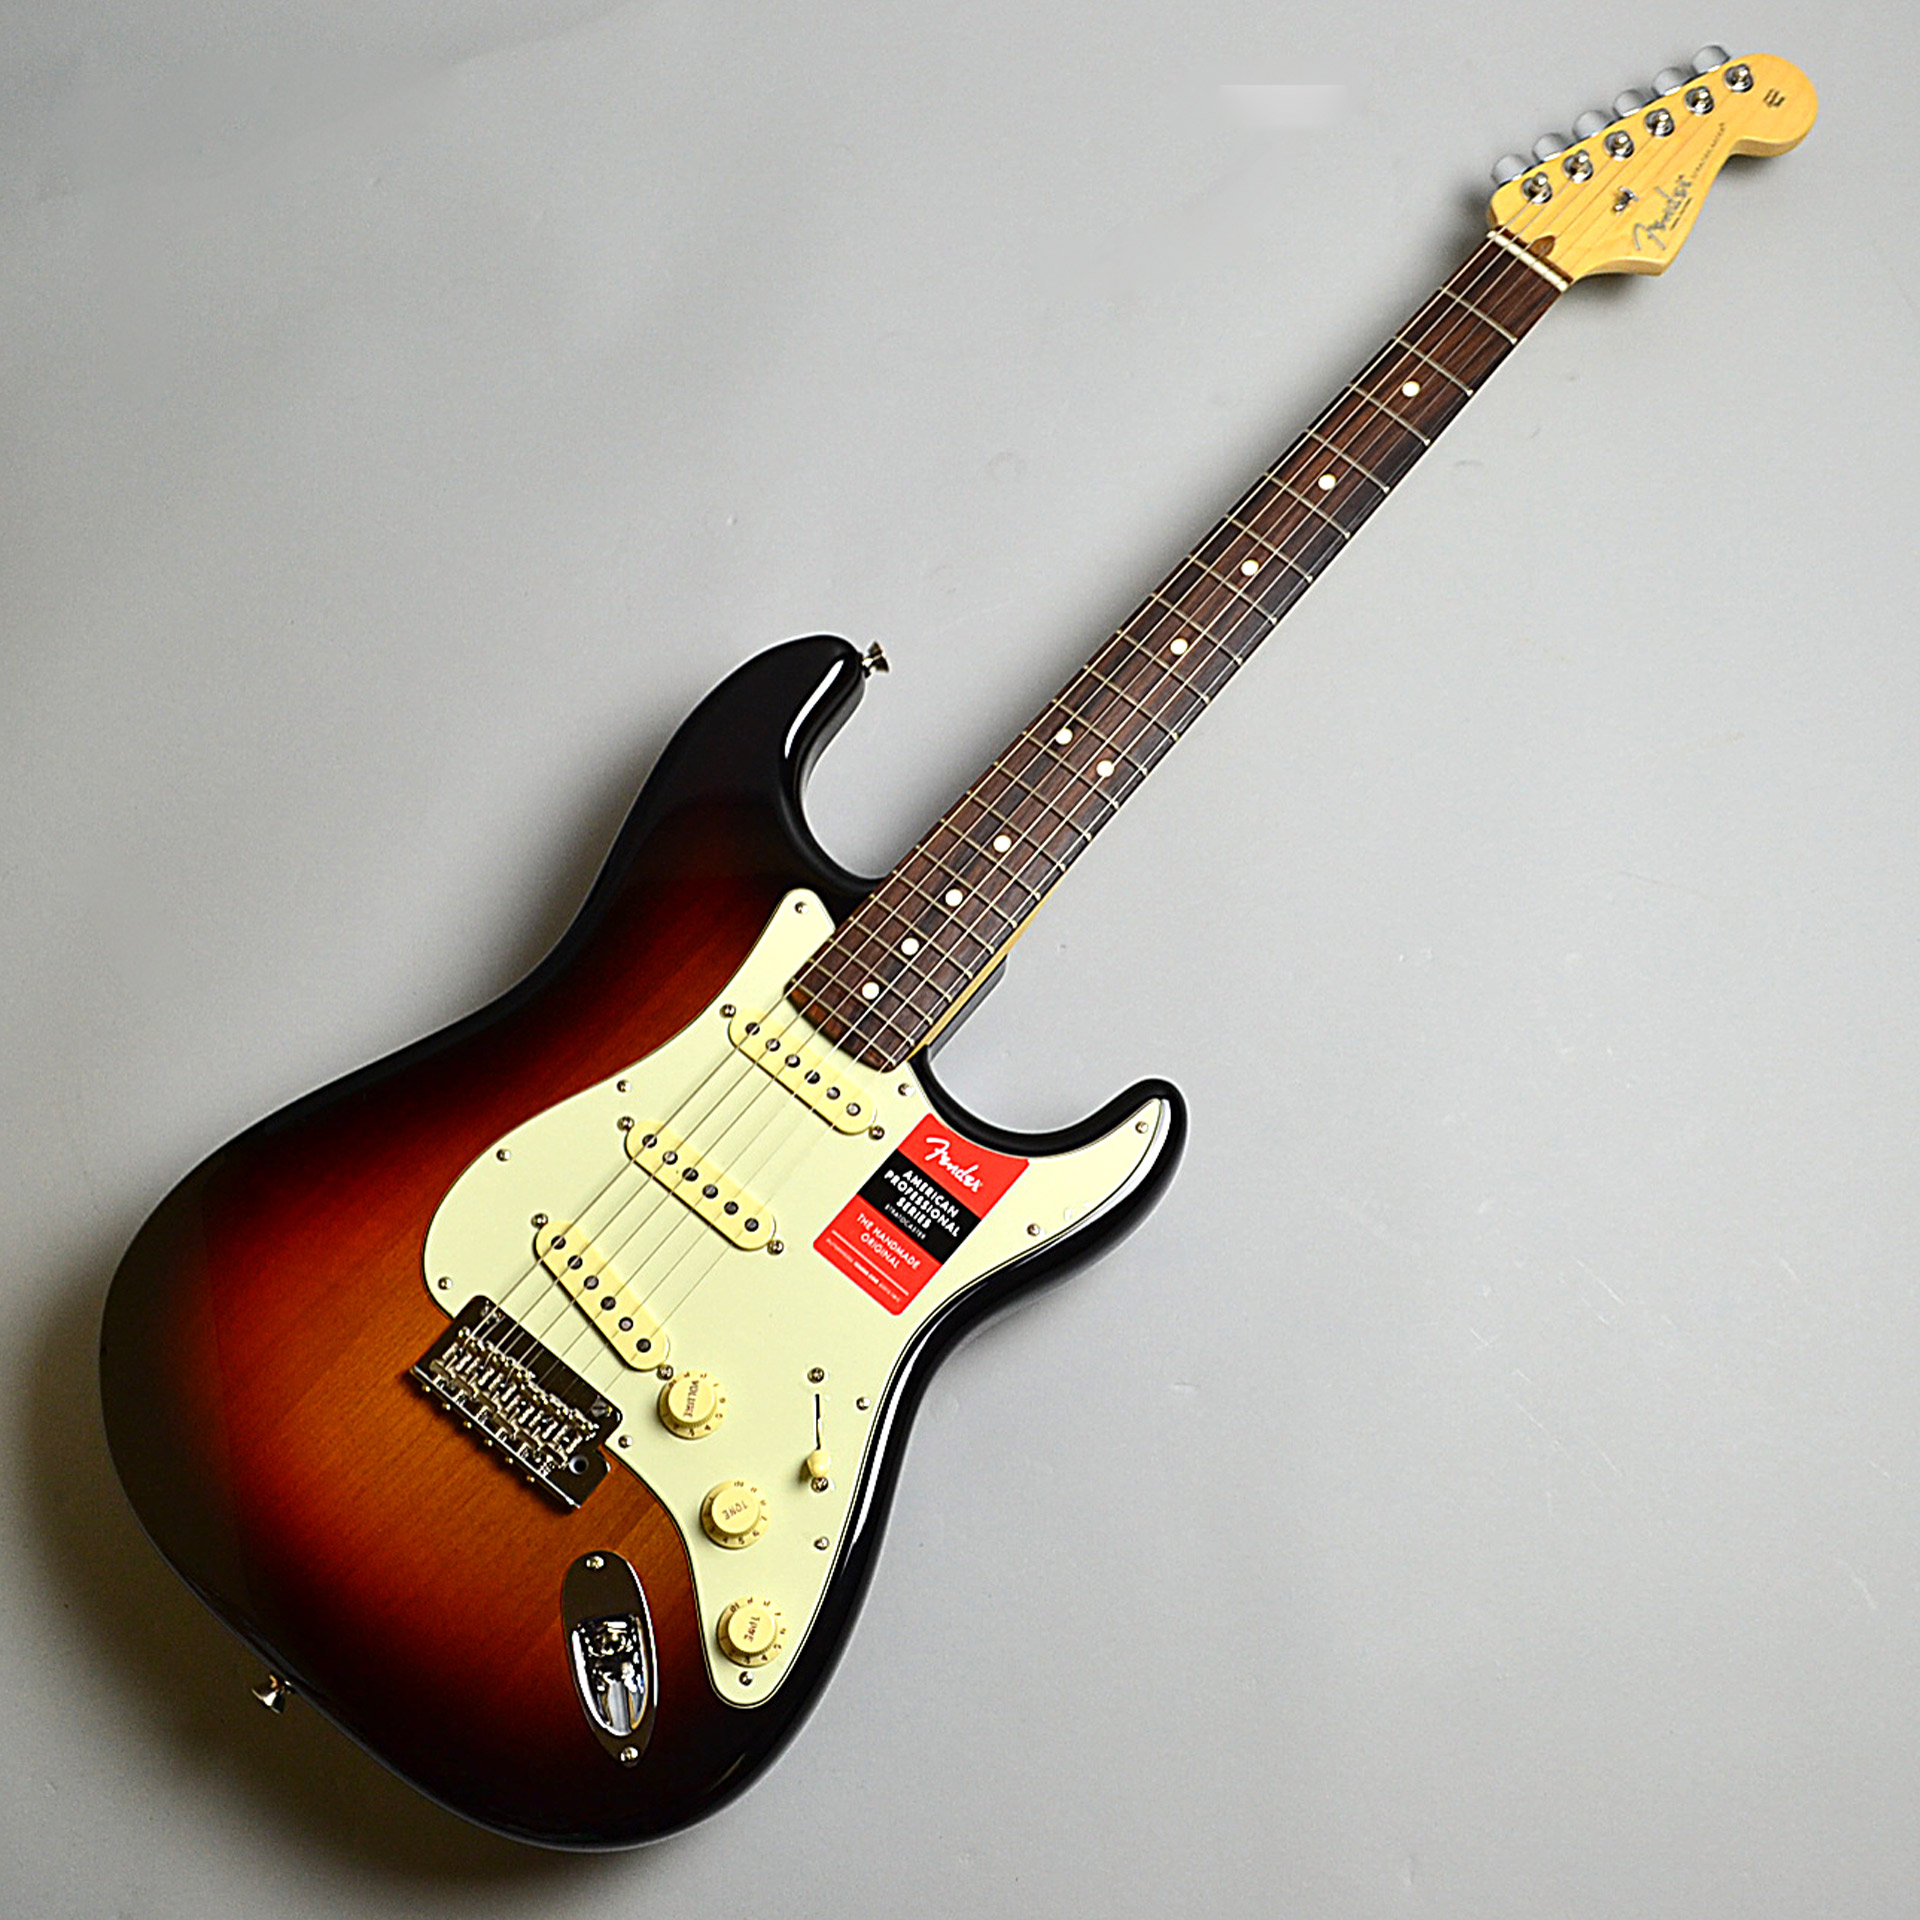 American Professional Stratocasterの全体画像(縦)